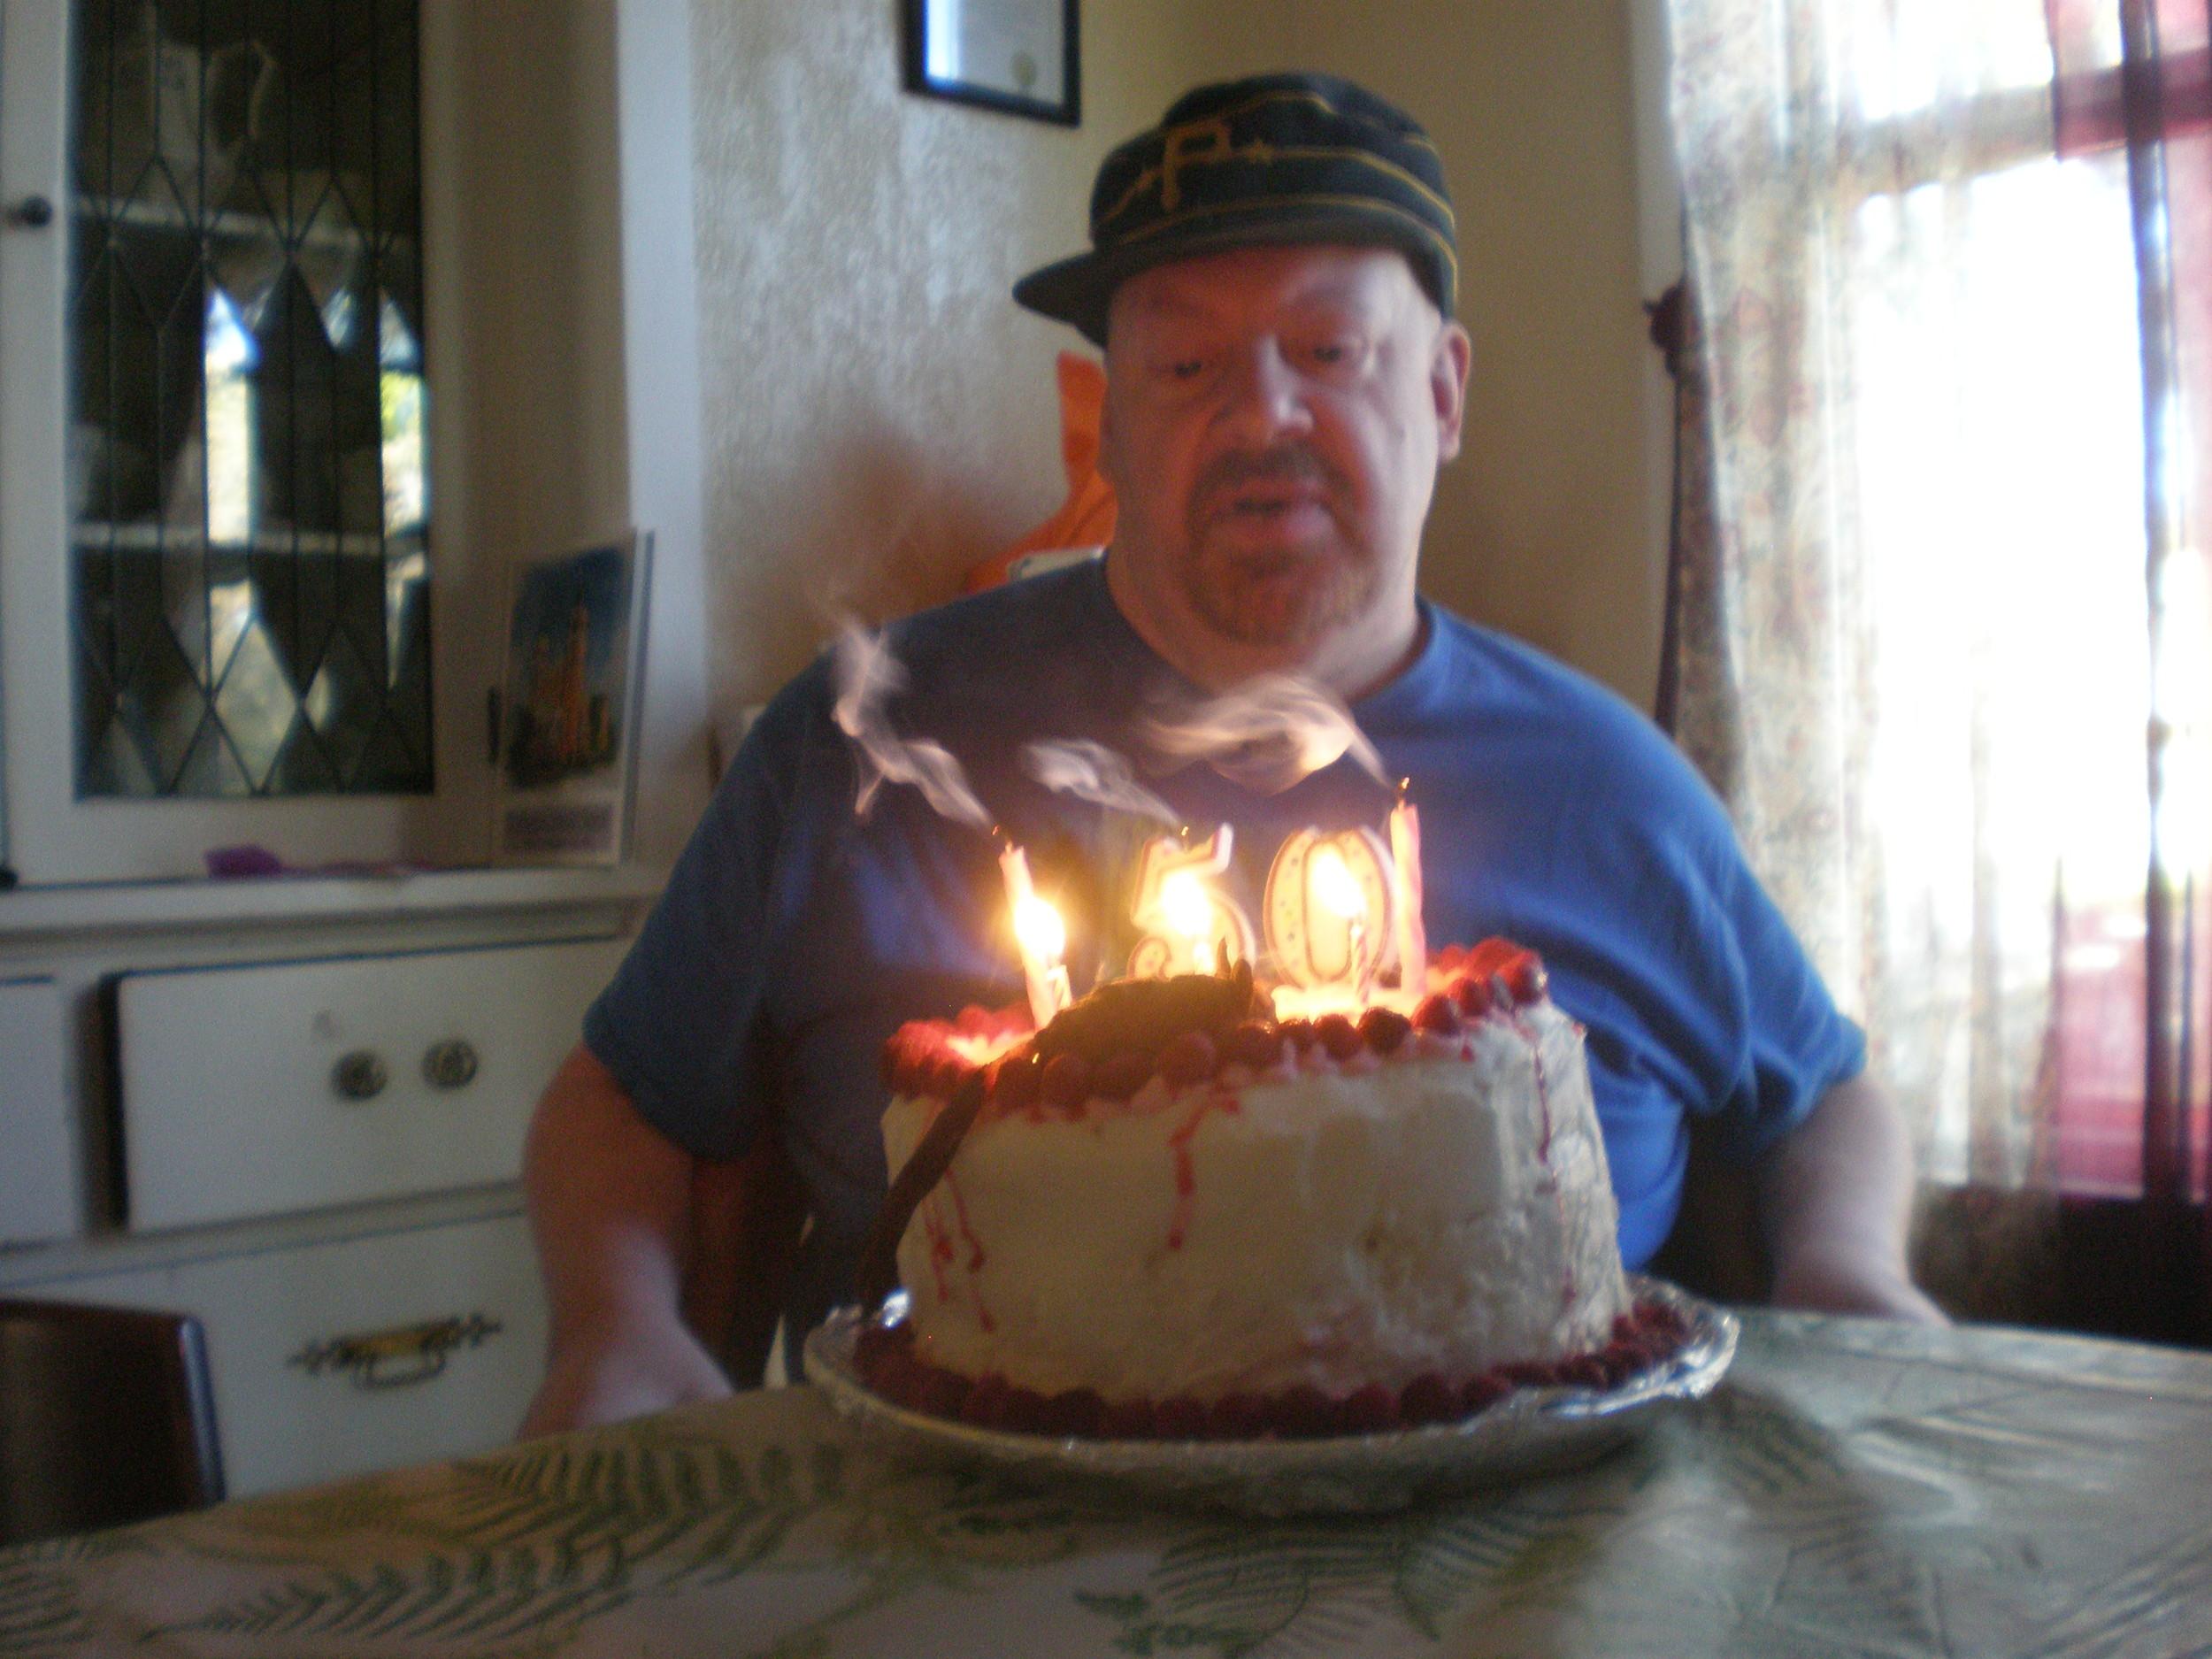 Core member, Lance celebrating his birthday.